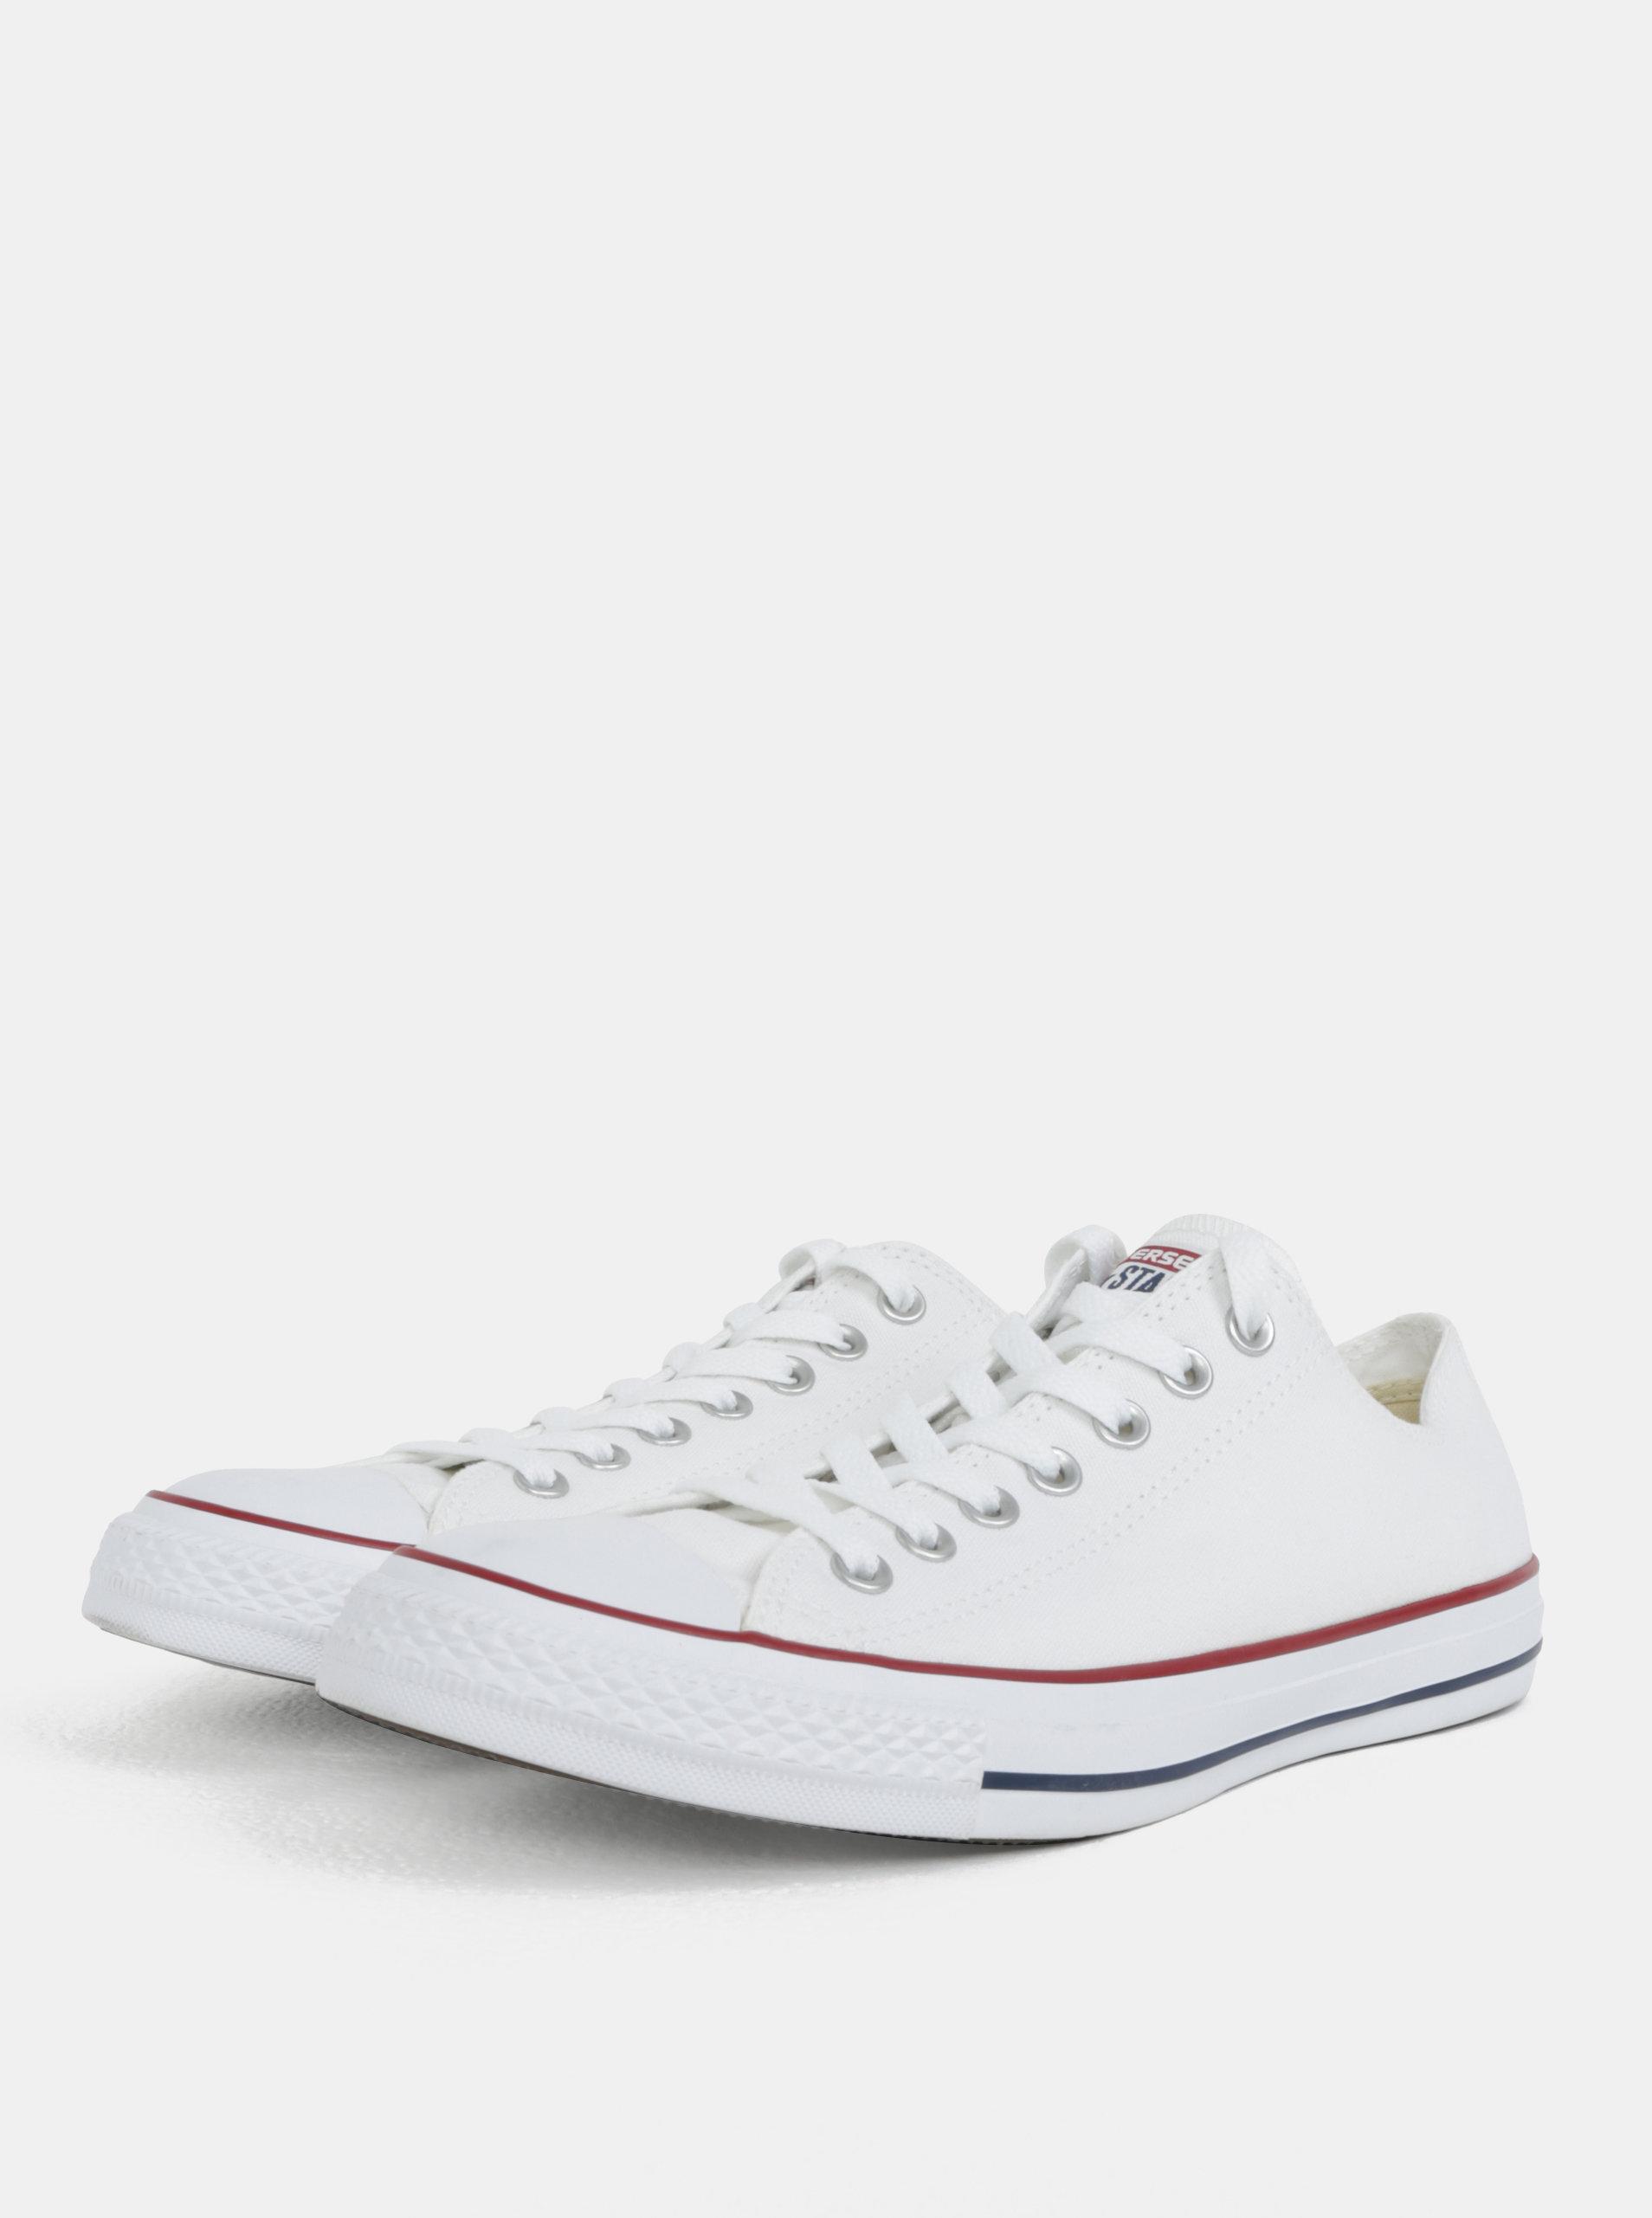 Bílé tenisky Converse Chuck Taylor All Star